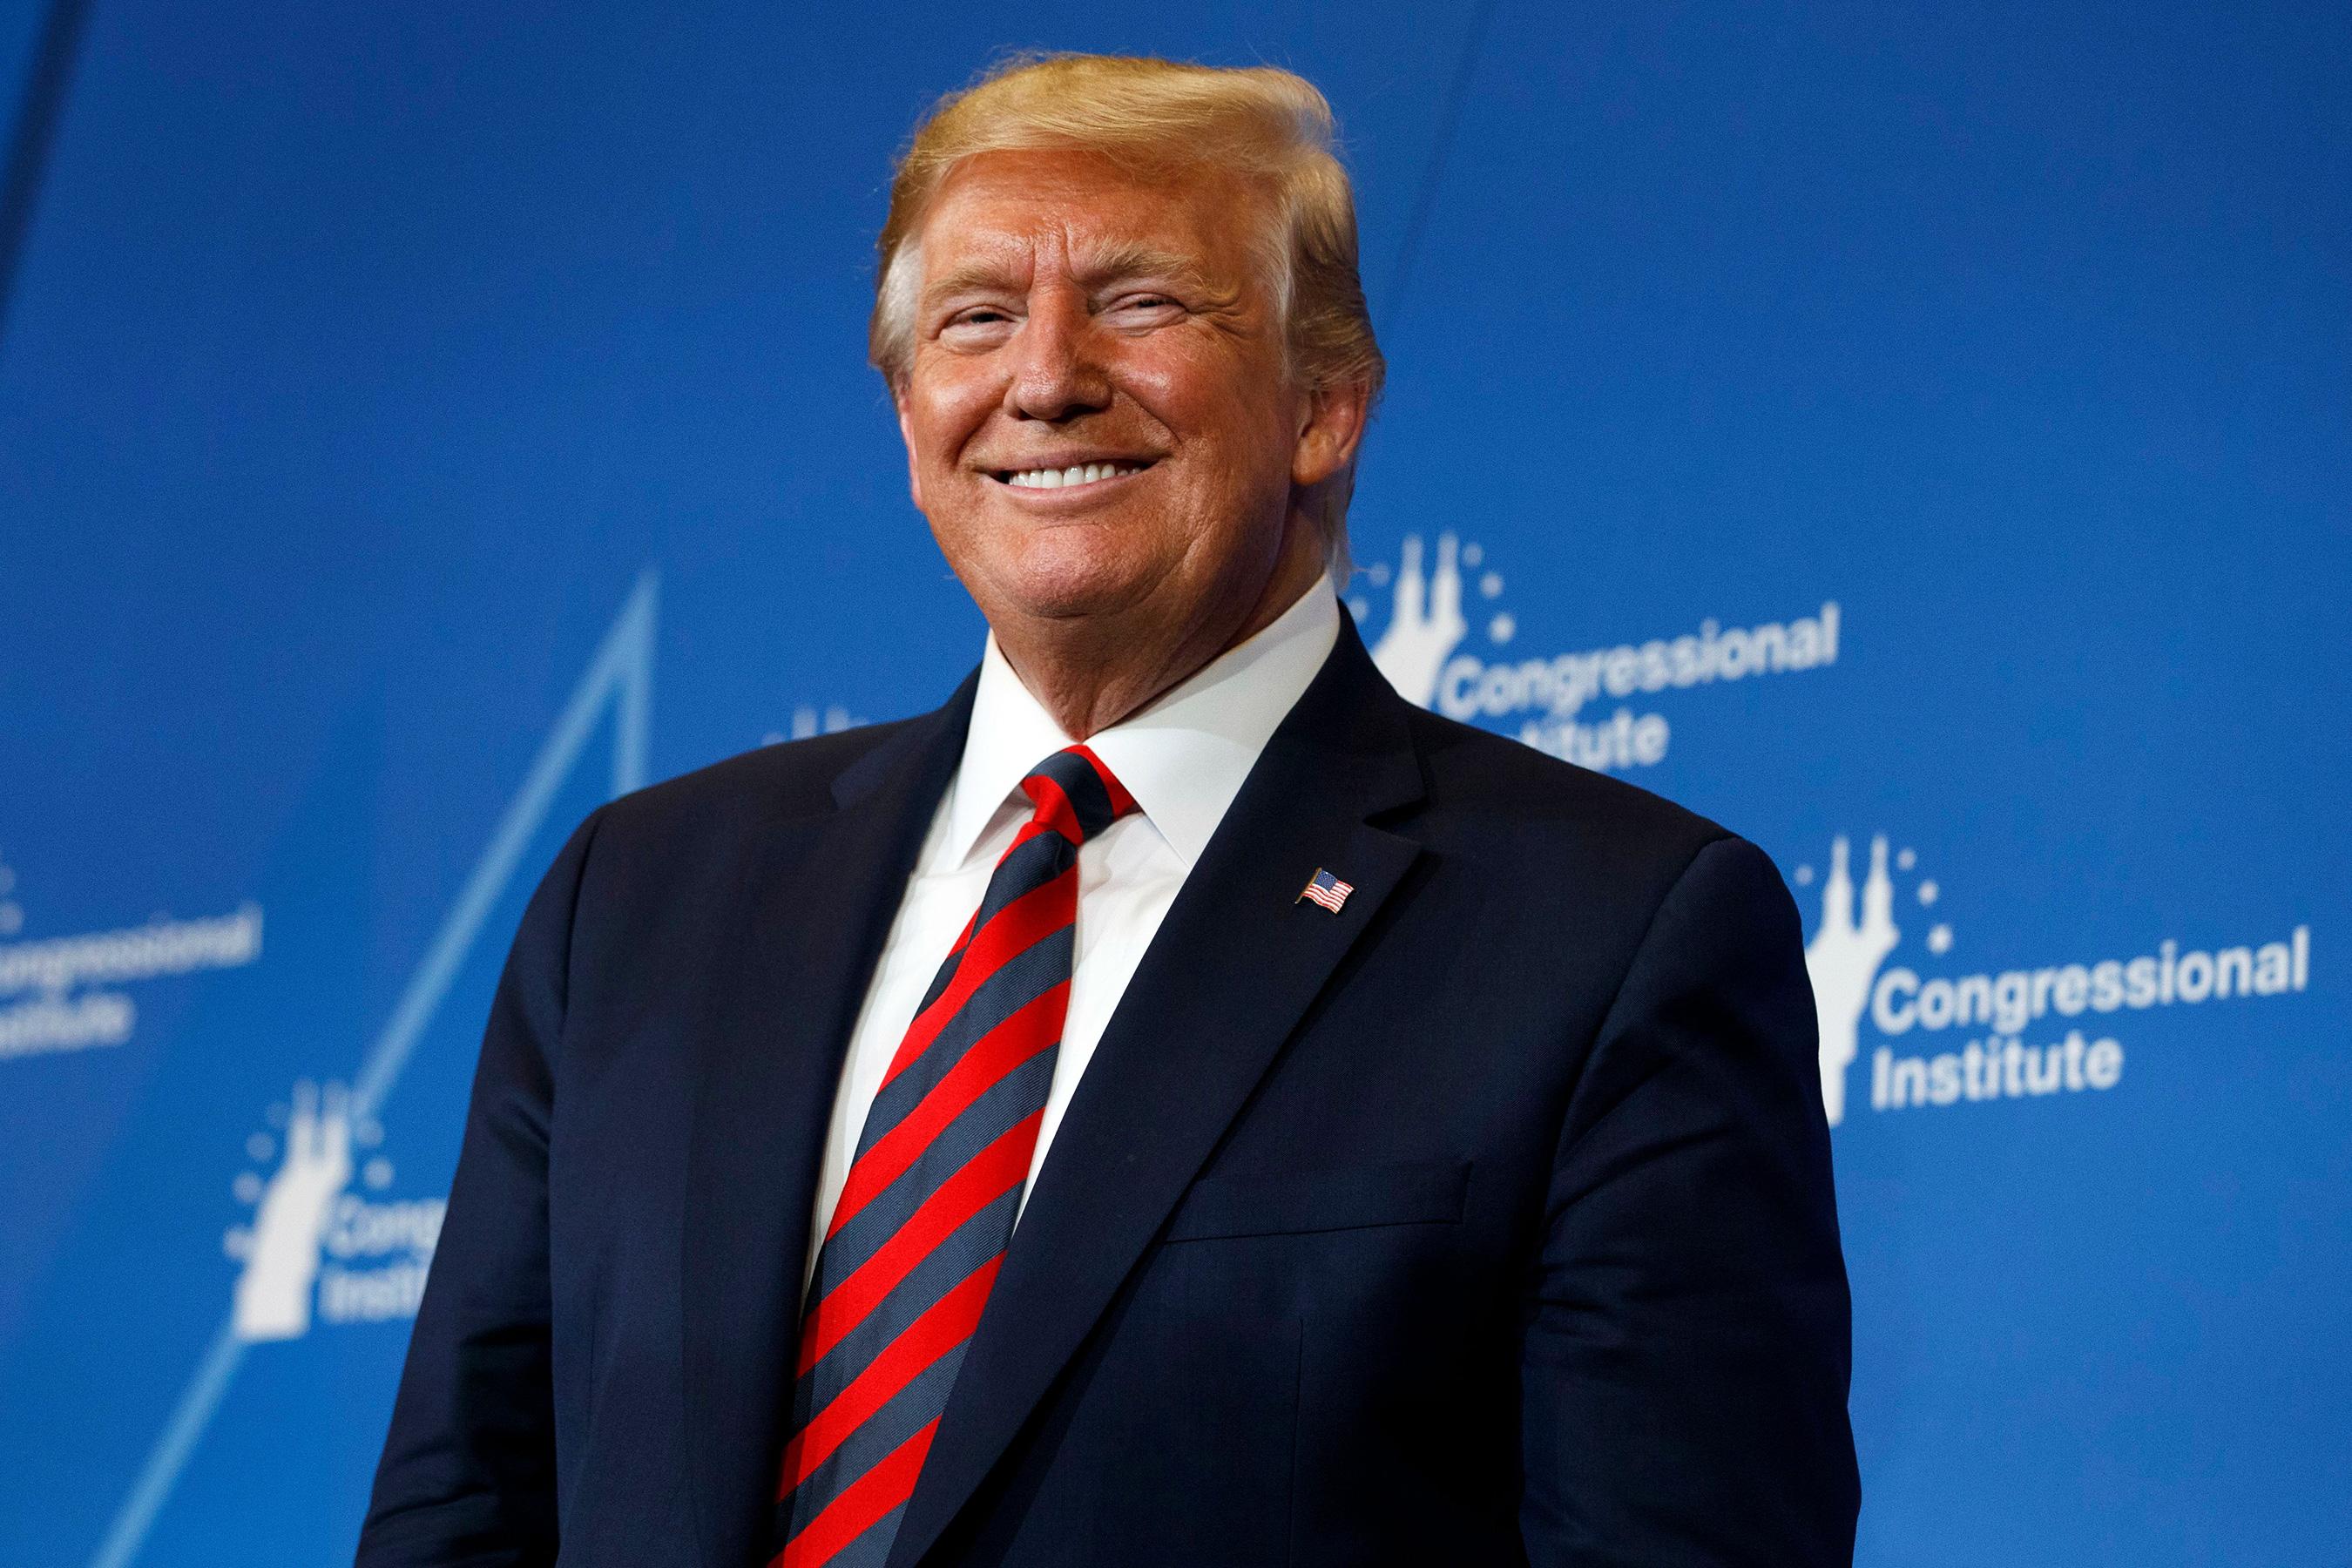 Trump - 12 Sep 2019